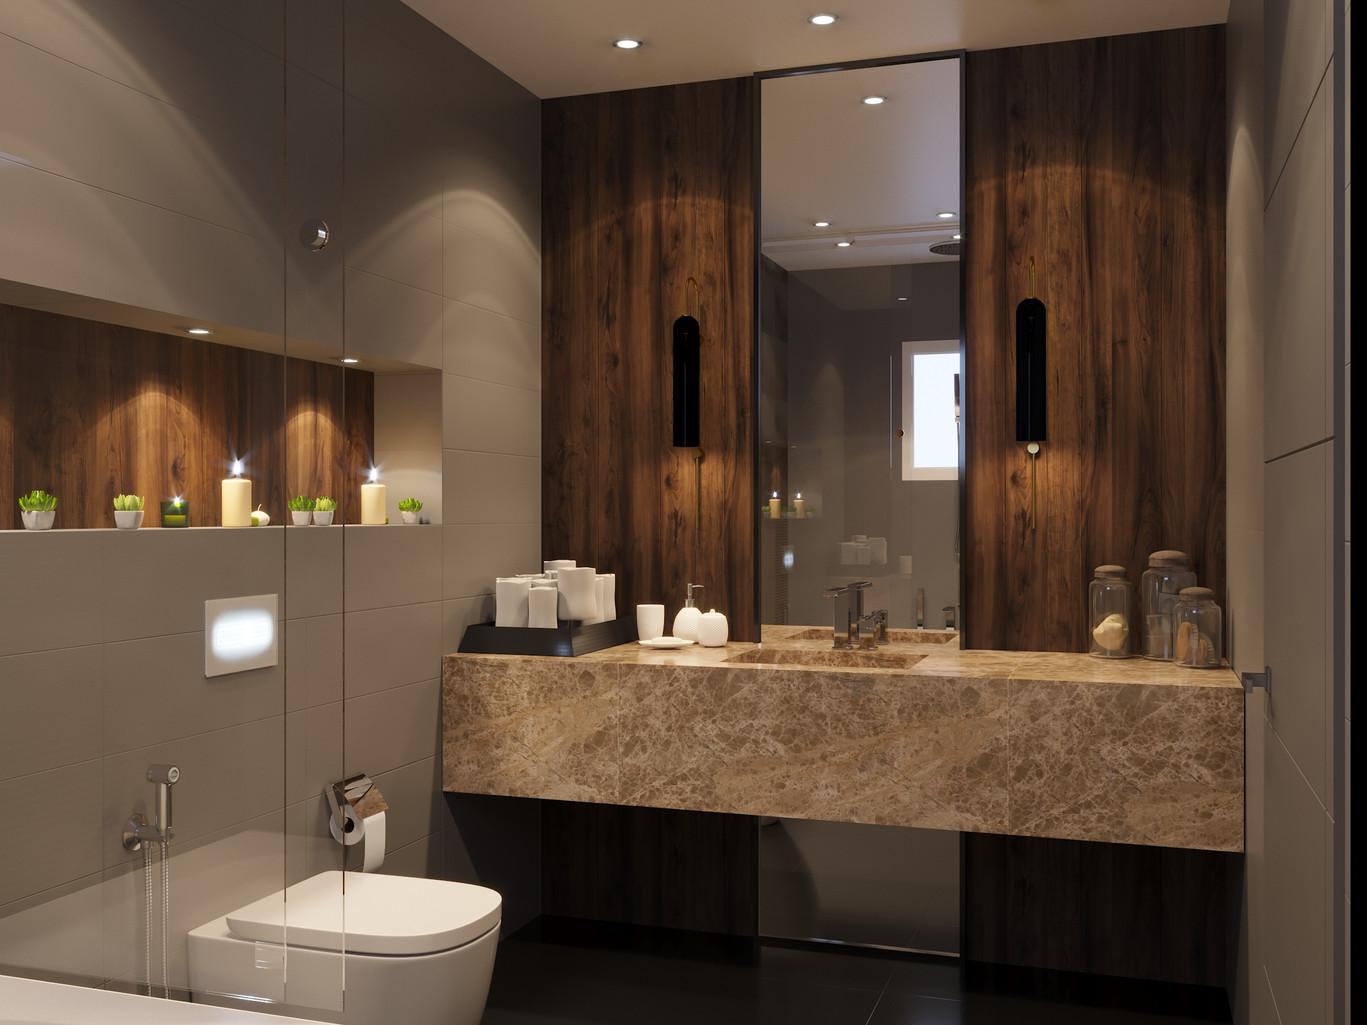 Aziz villa - office bathroom - 03.jpg